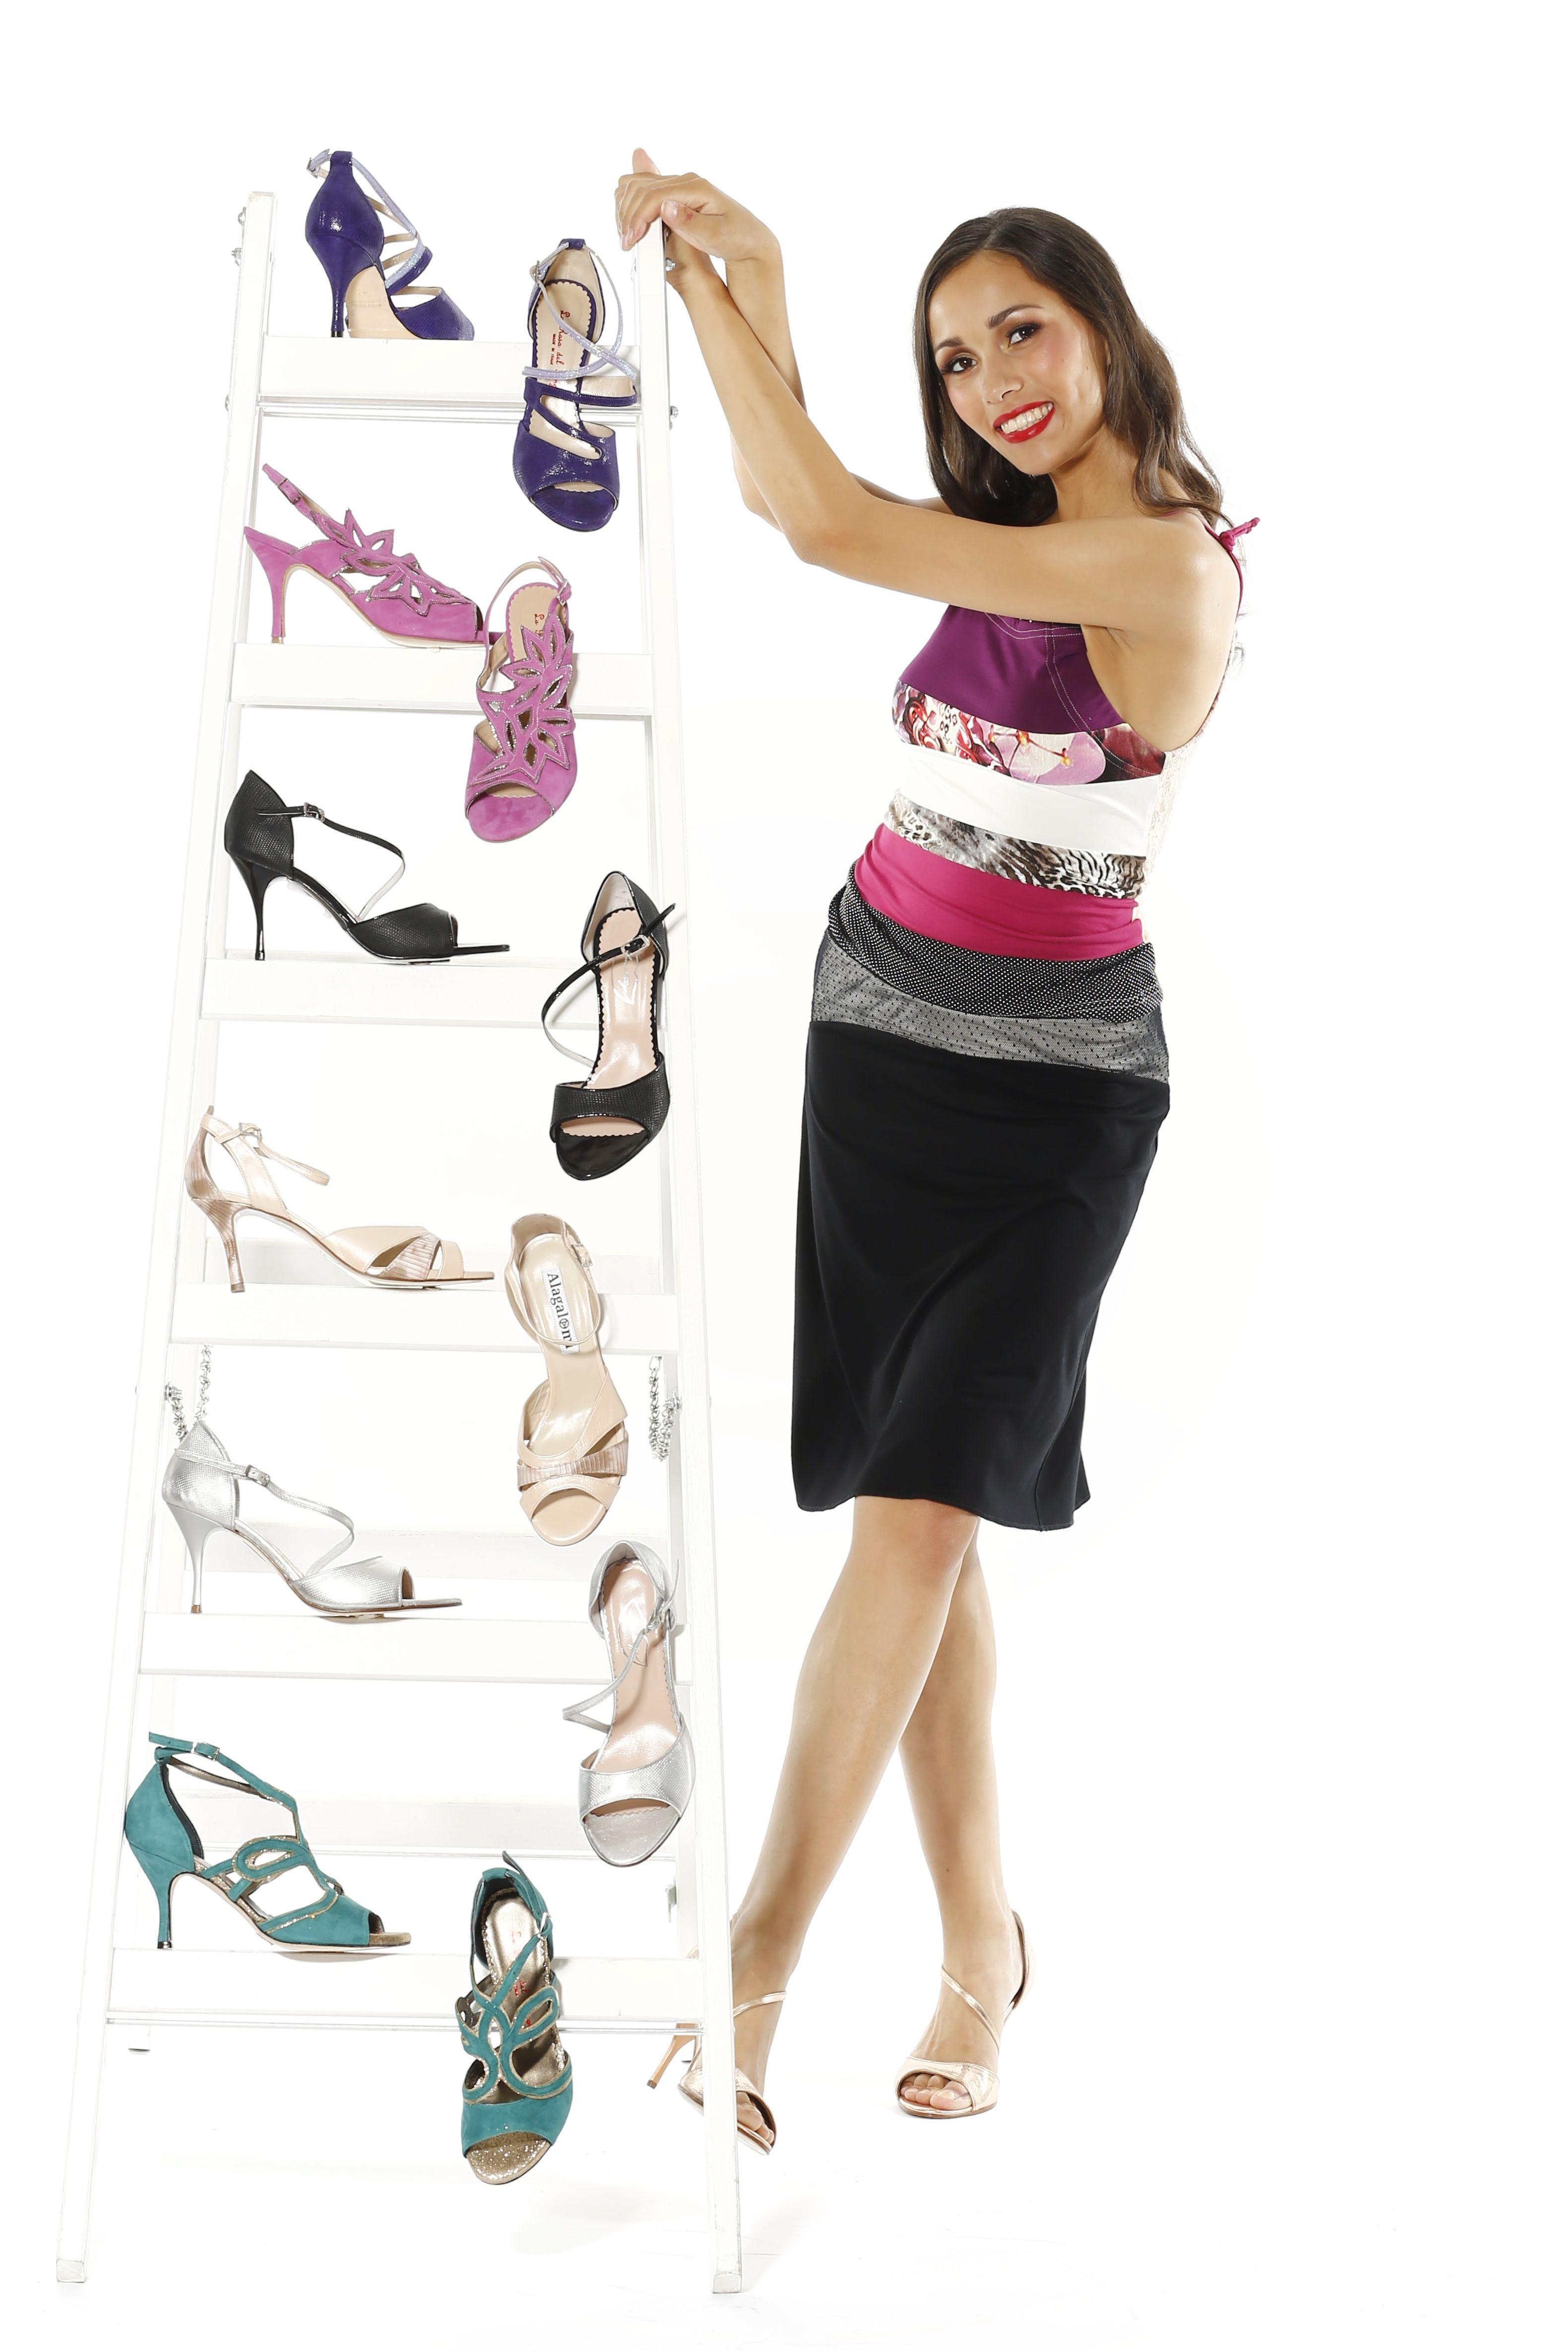 """Yes, I am addicted to tango shoes. No, I don`t need help."" #TangoArgentino, #TangoBerlin, #Tangoshoes, #MavaLou"